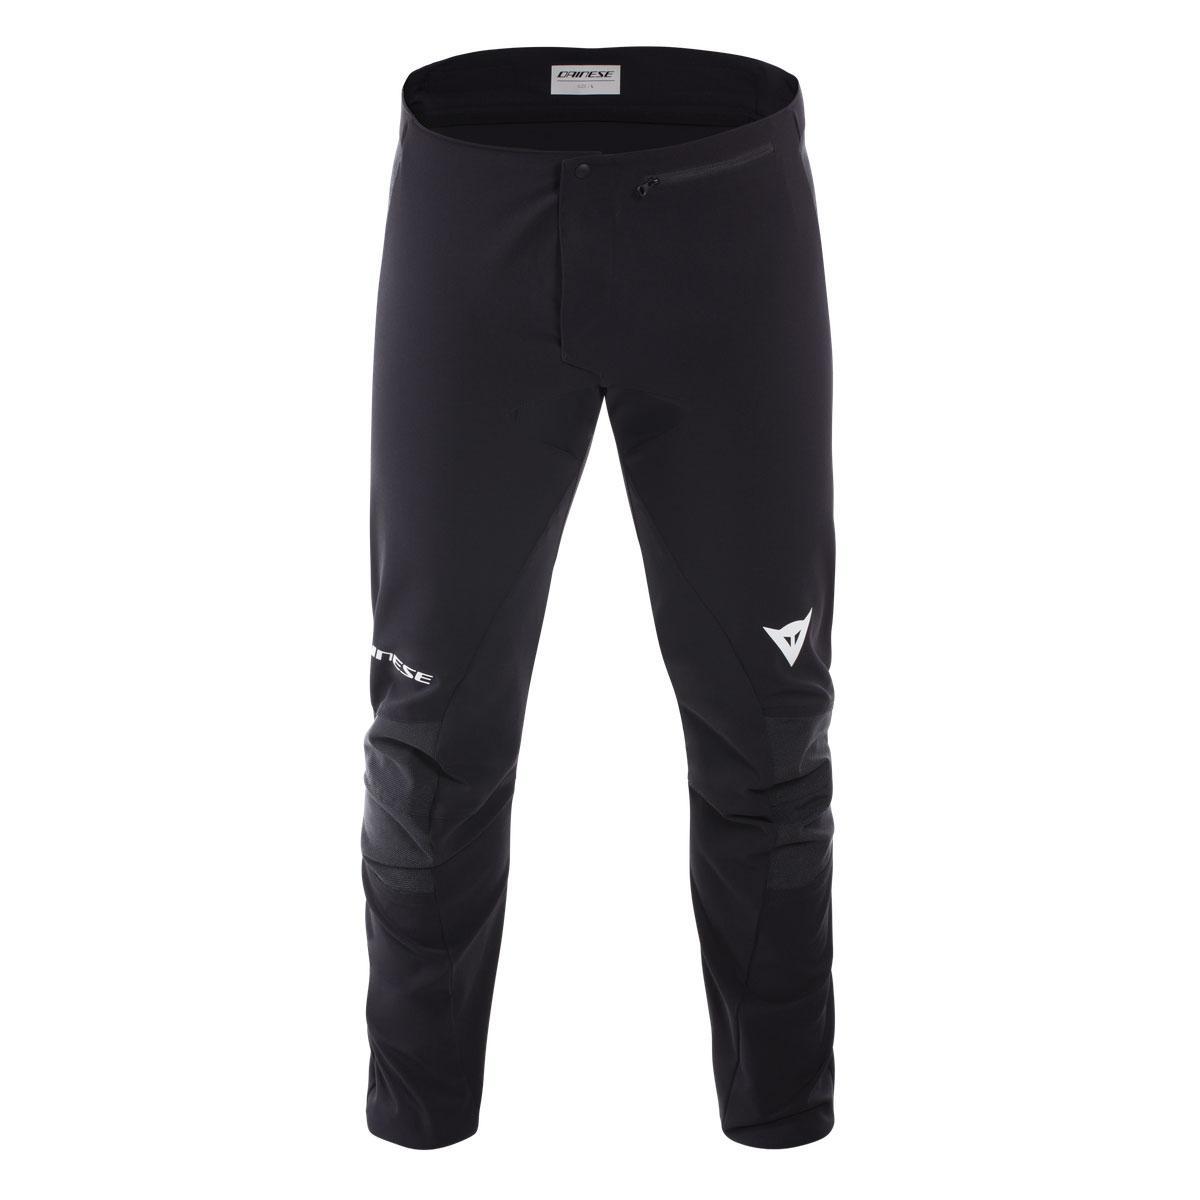 Dainese HG1 Pants